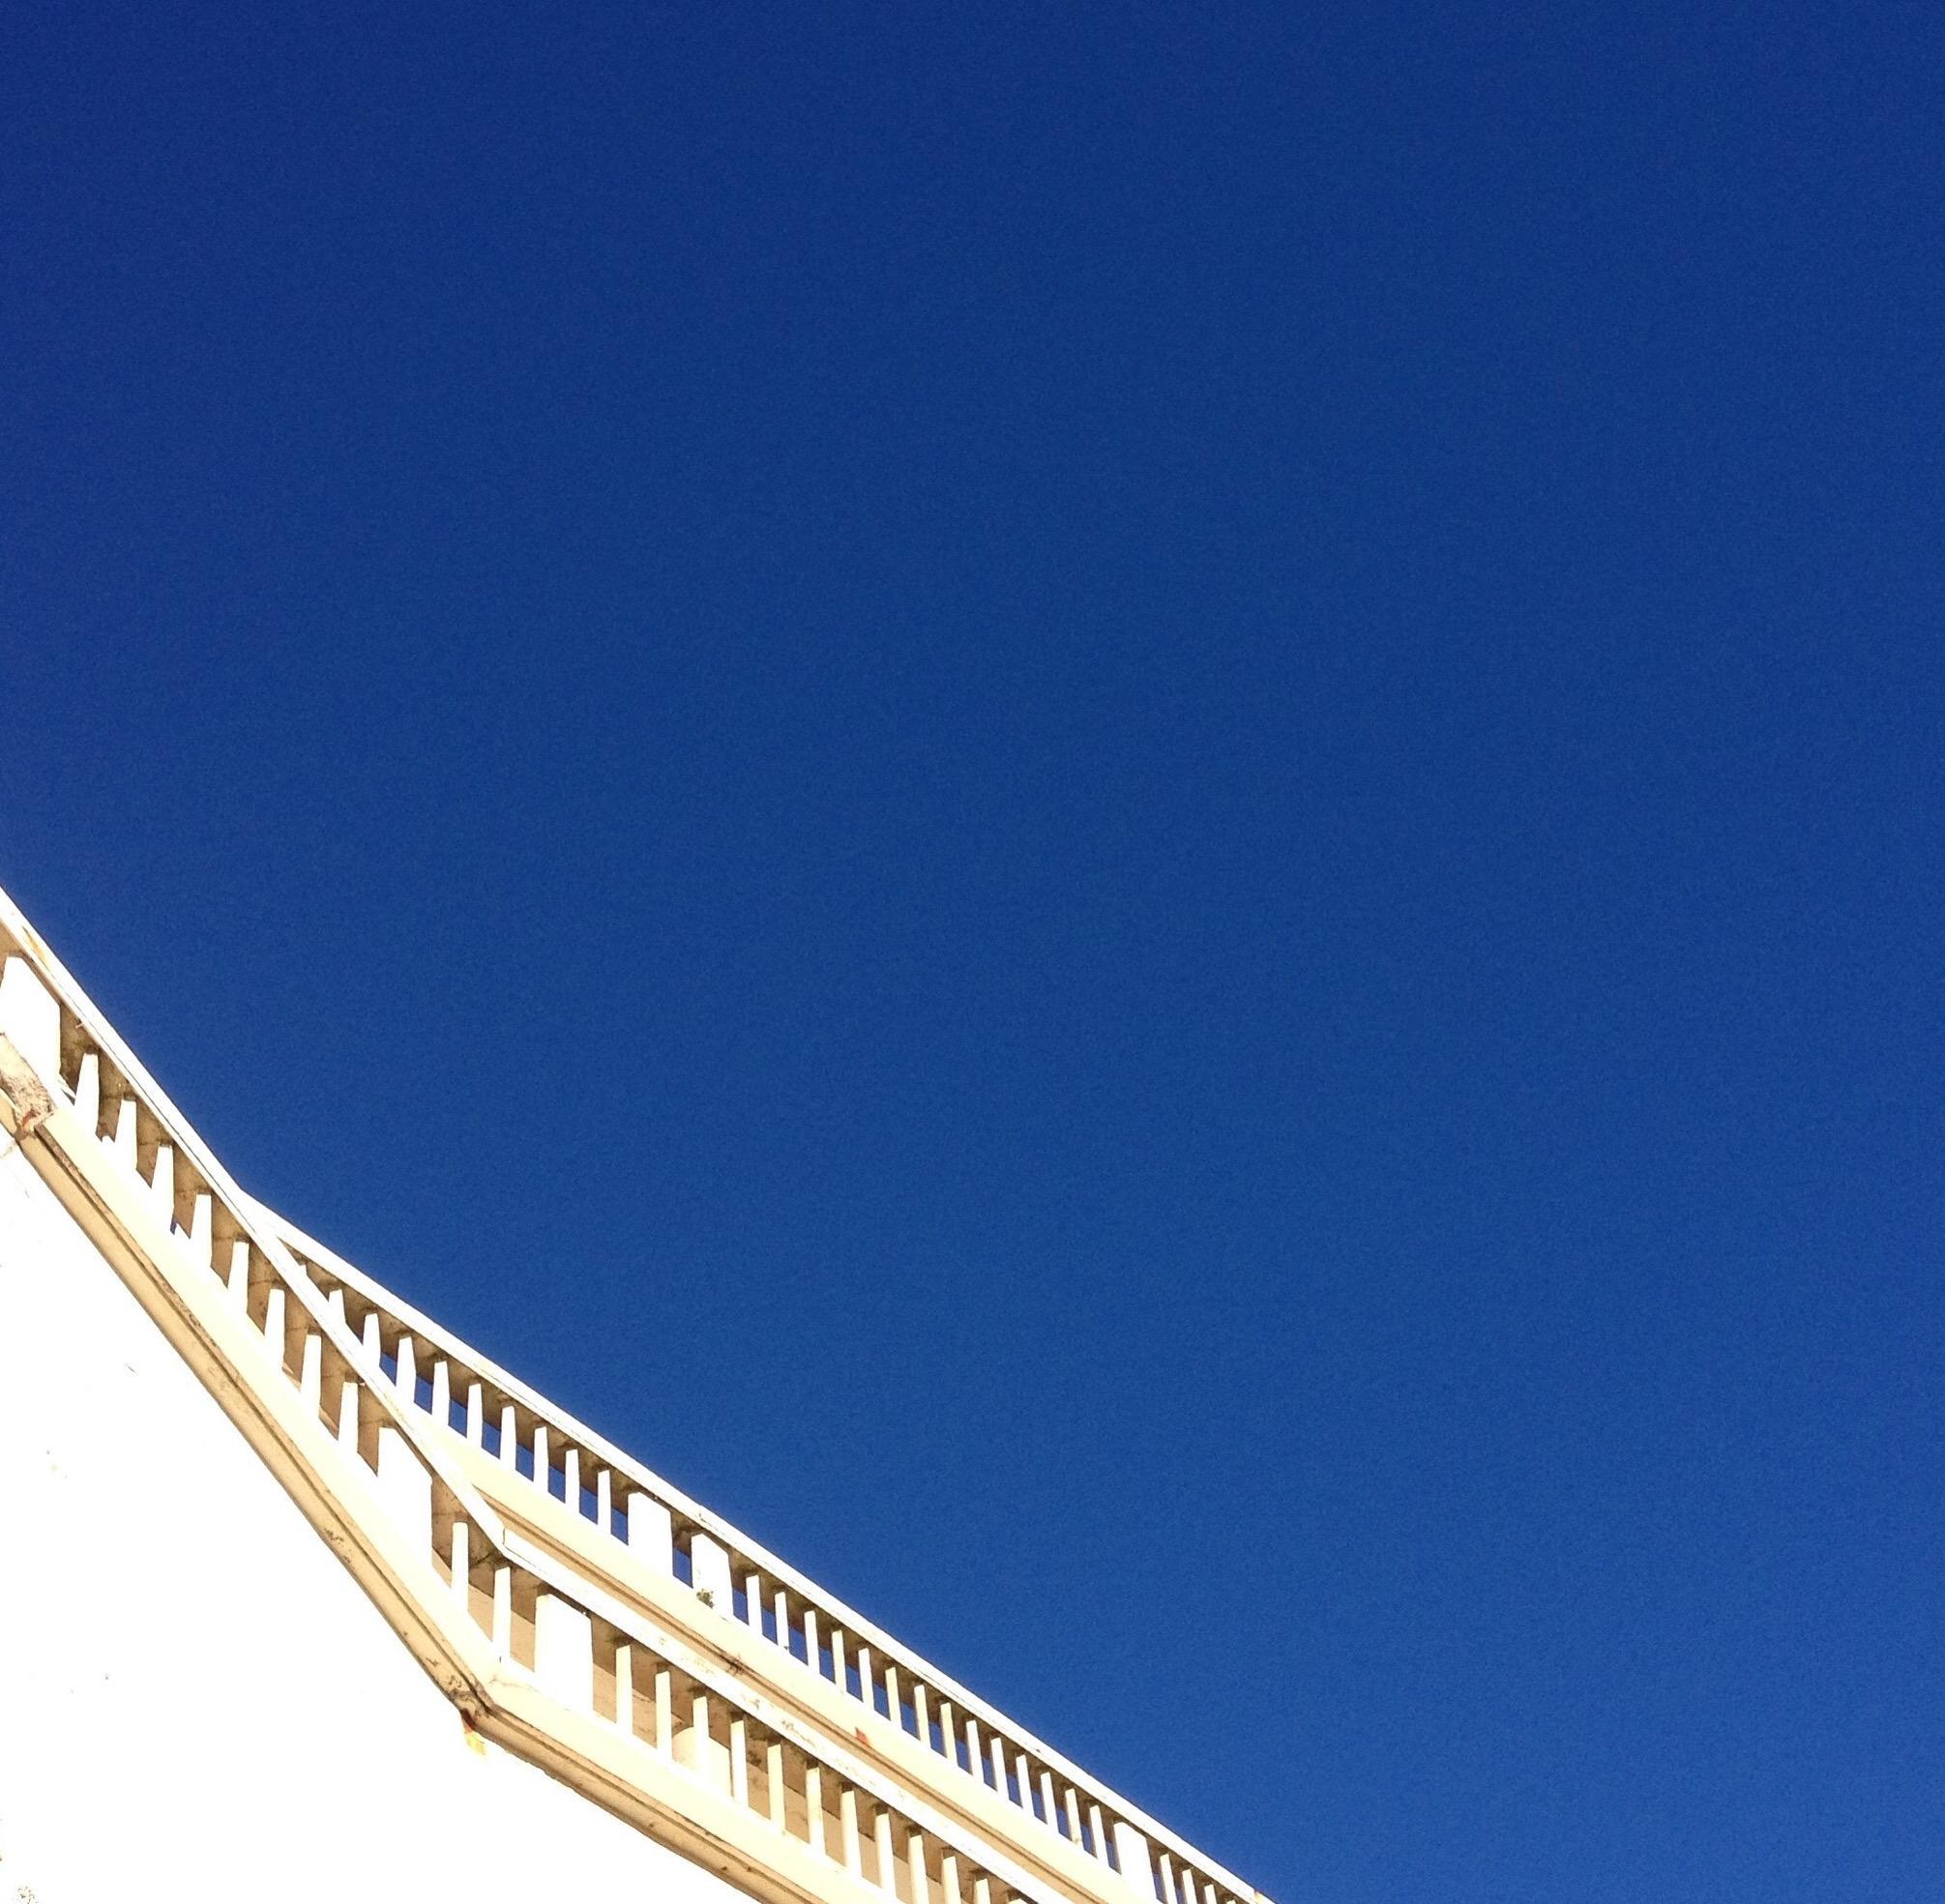 Port vieux balcon Biarritz